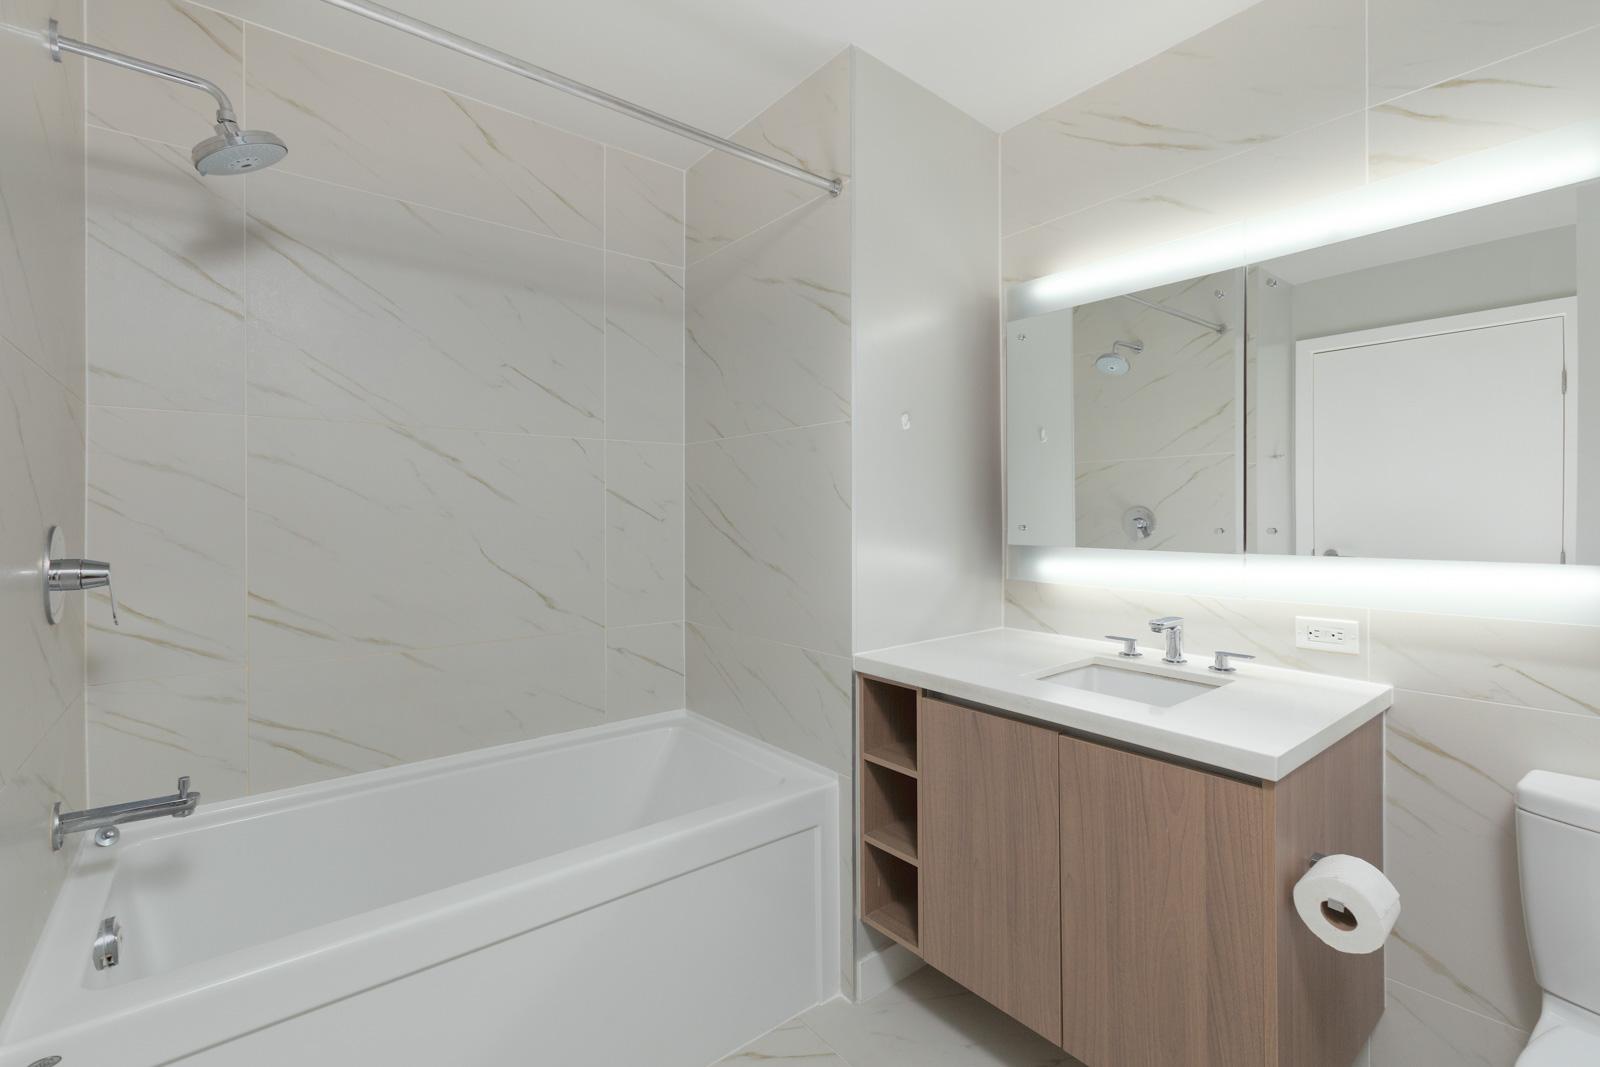 Bathroom with white walls and ceramic bath tub